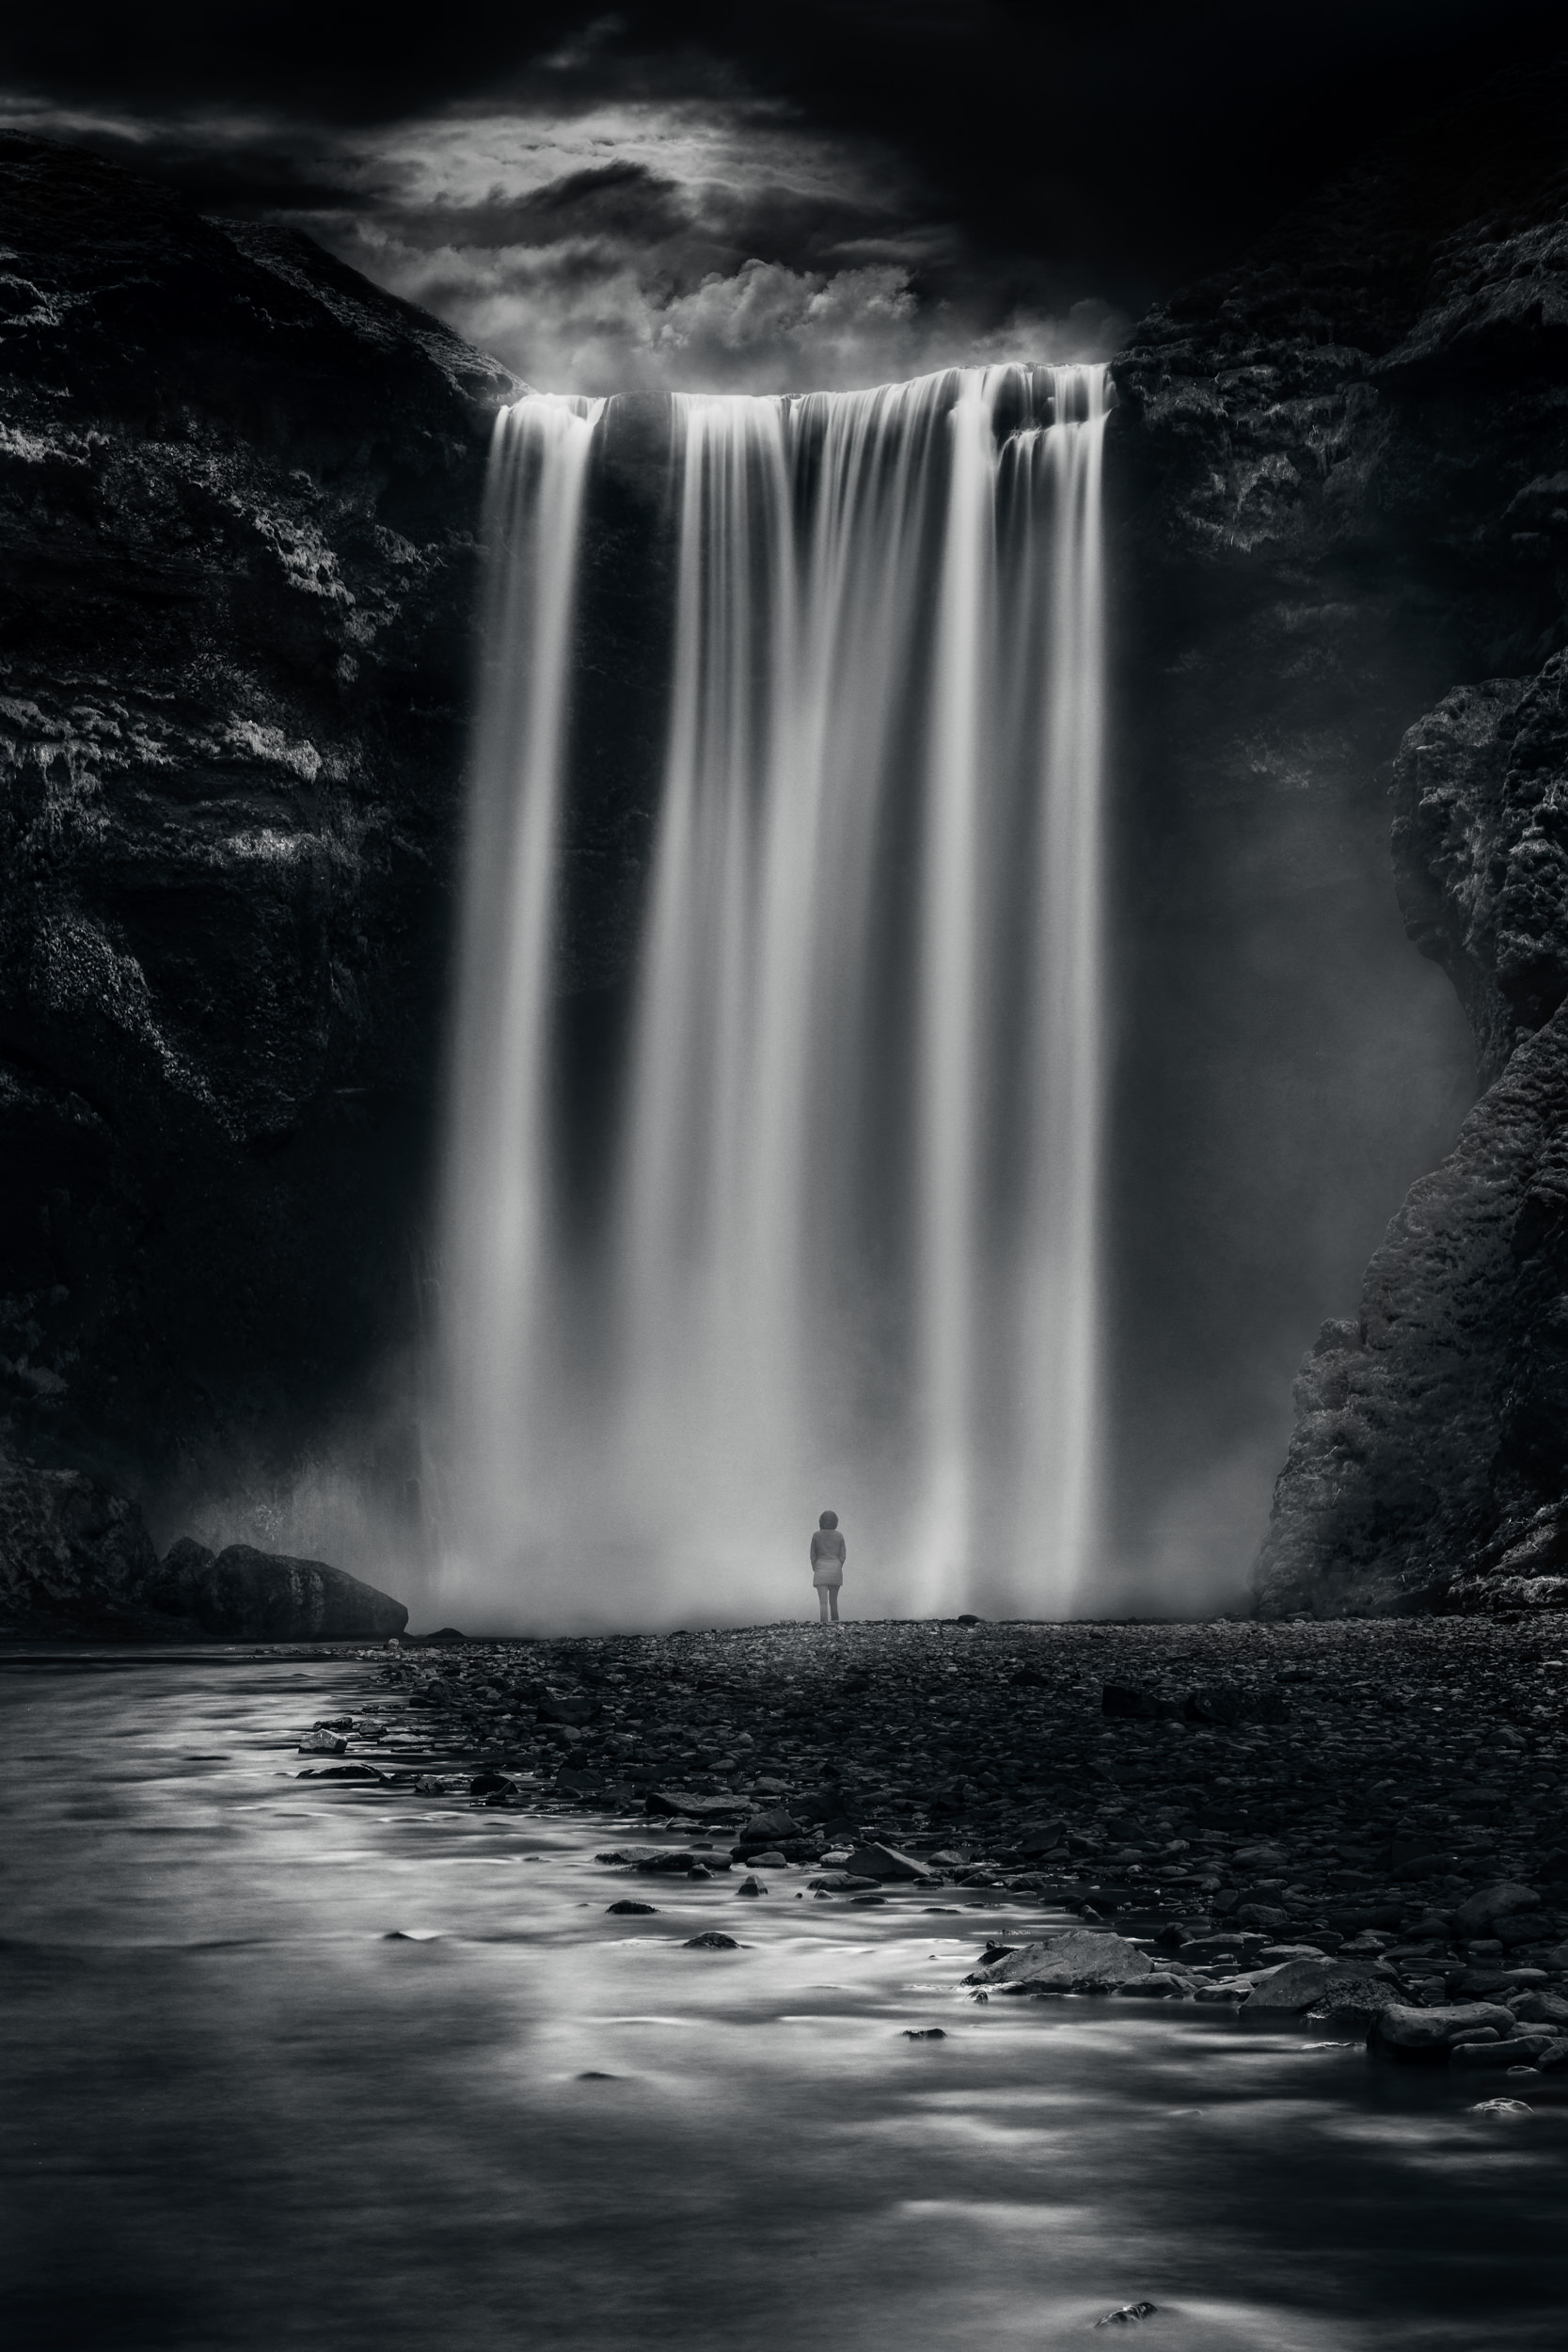 Dave Wall Photographer